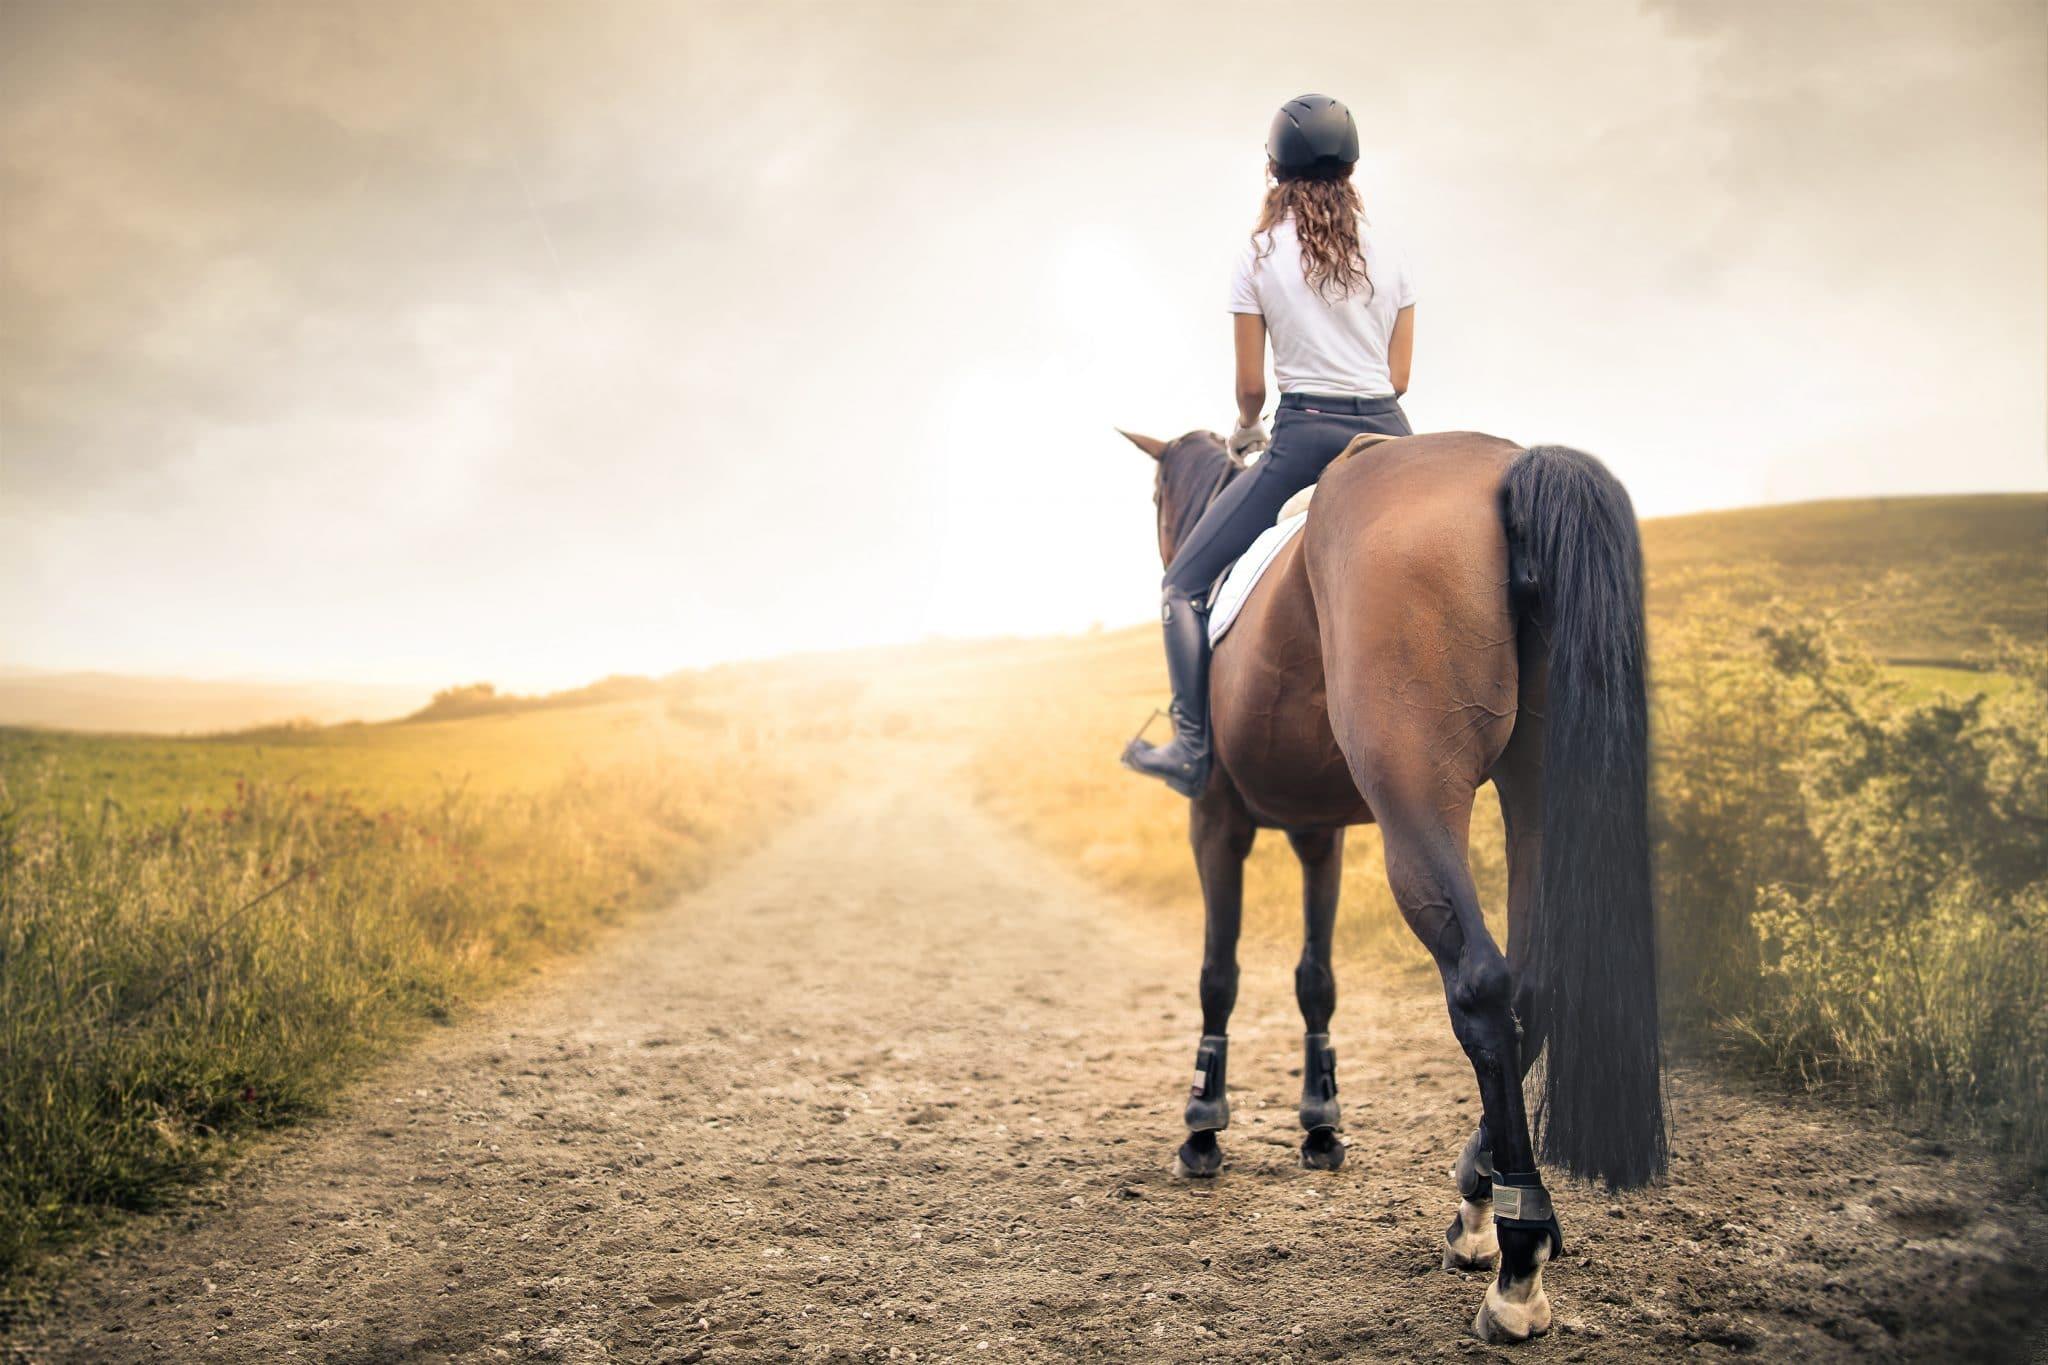 pferd rettet 16jährige vor angreifer